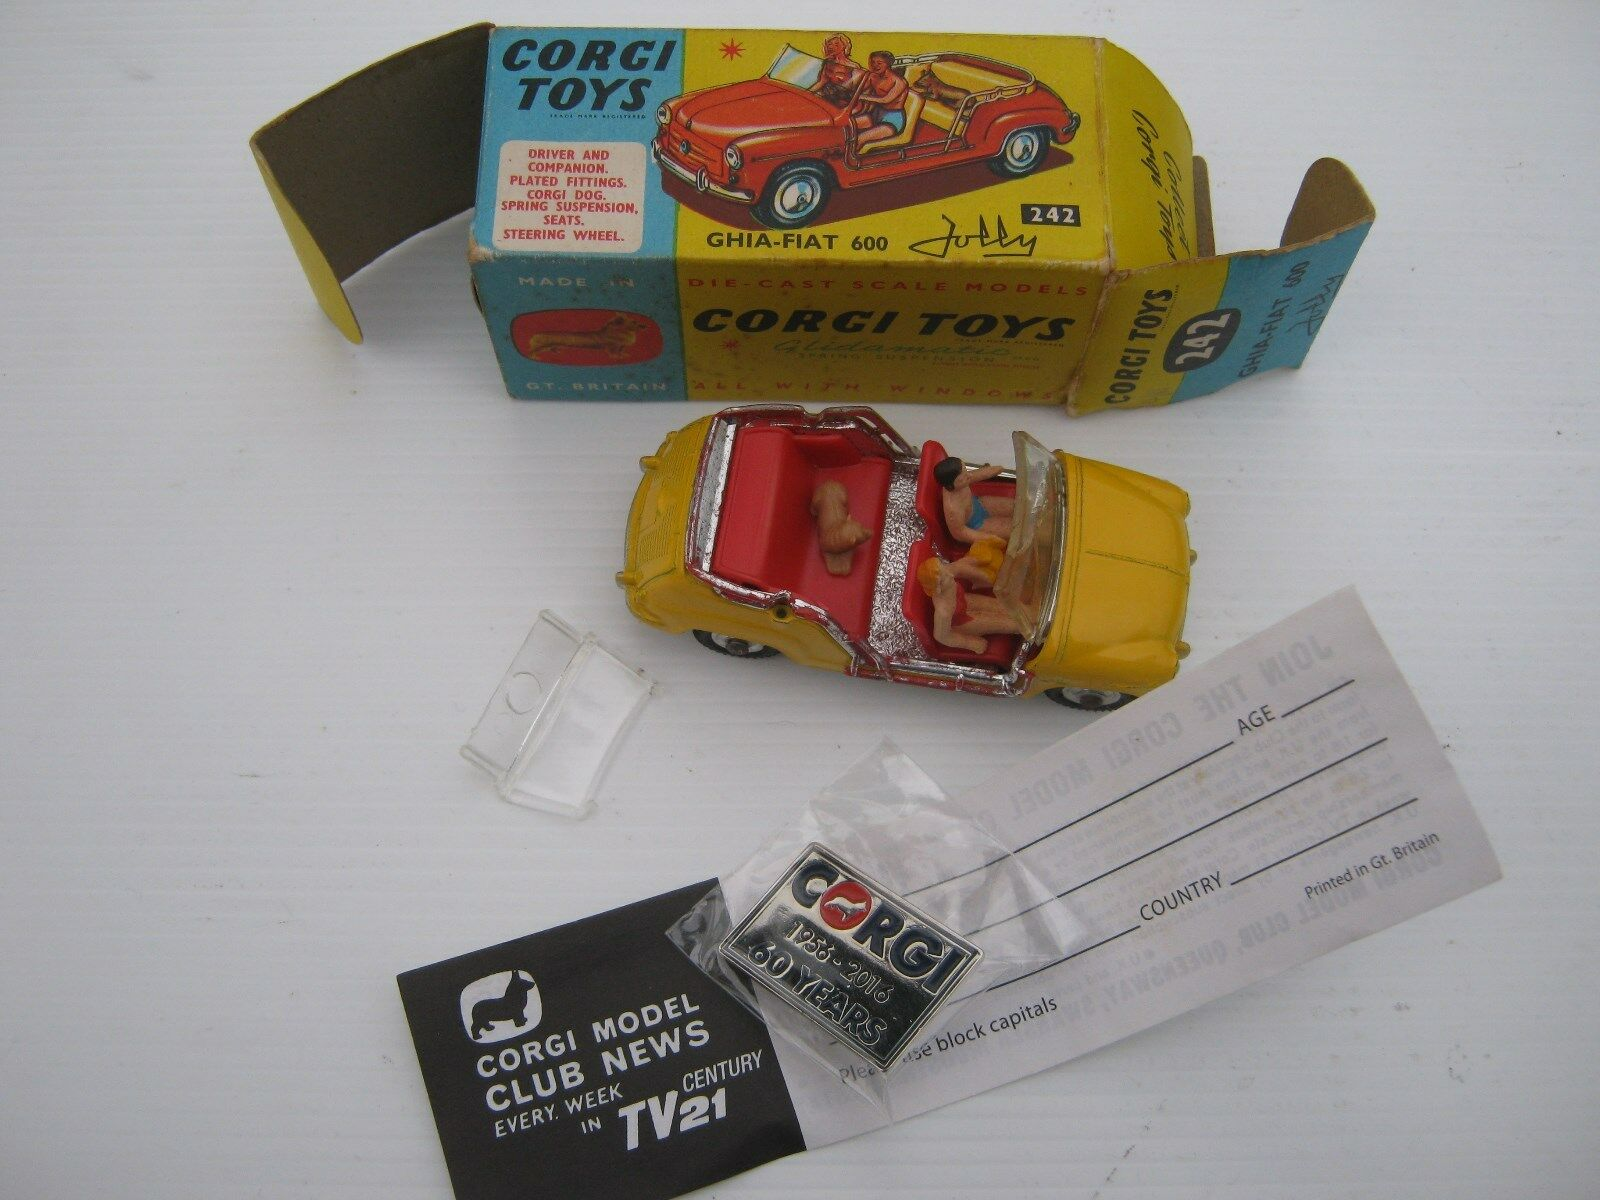 CORGI 242 fiat jolly 600 1965 very rare All Original not Comme neuf as described